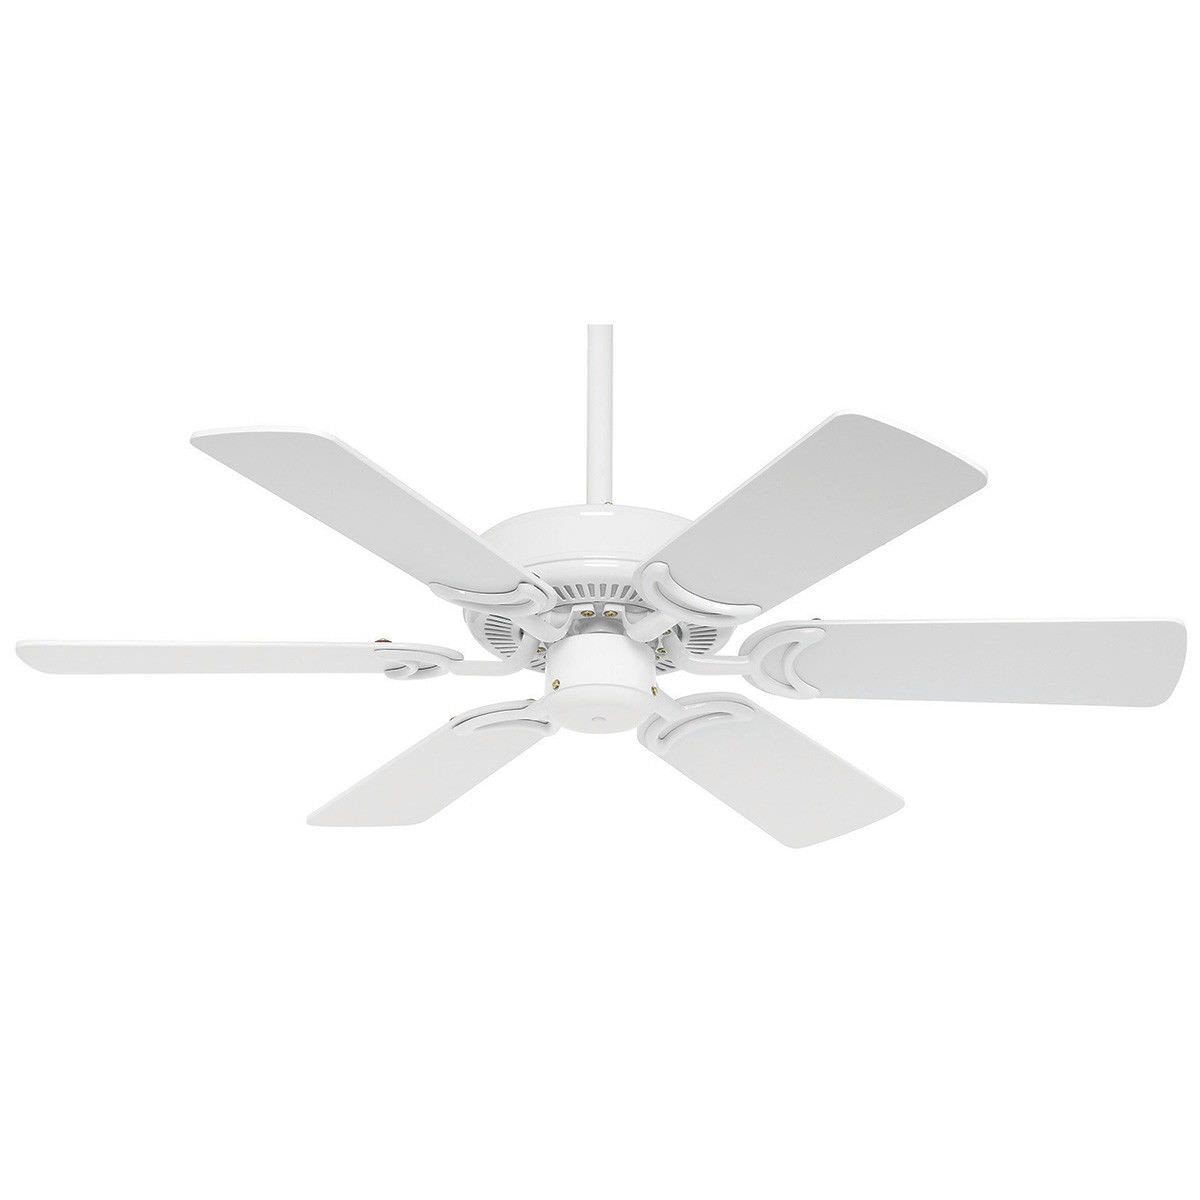 "Hamilton Timber Ceiling Fan, 90cm/36"", White"